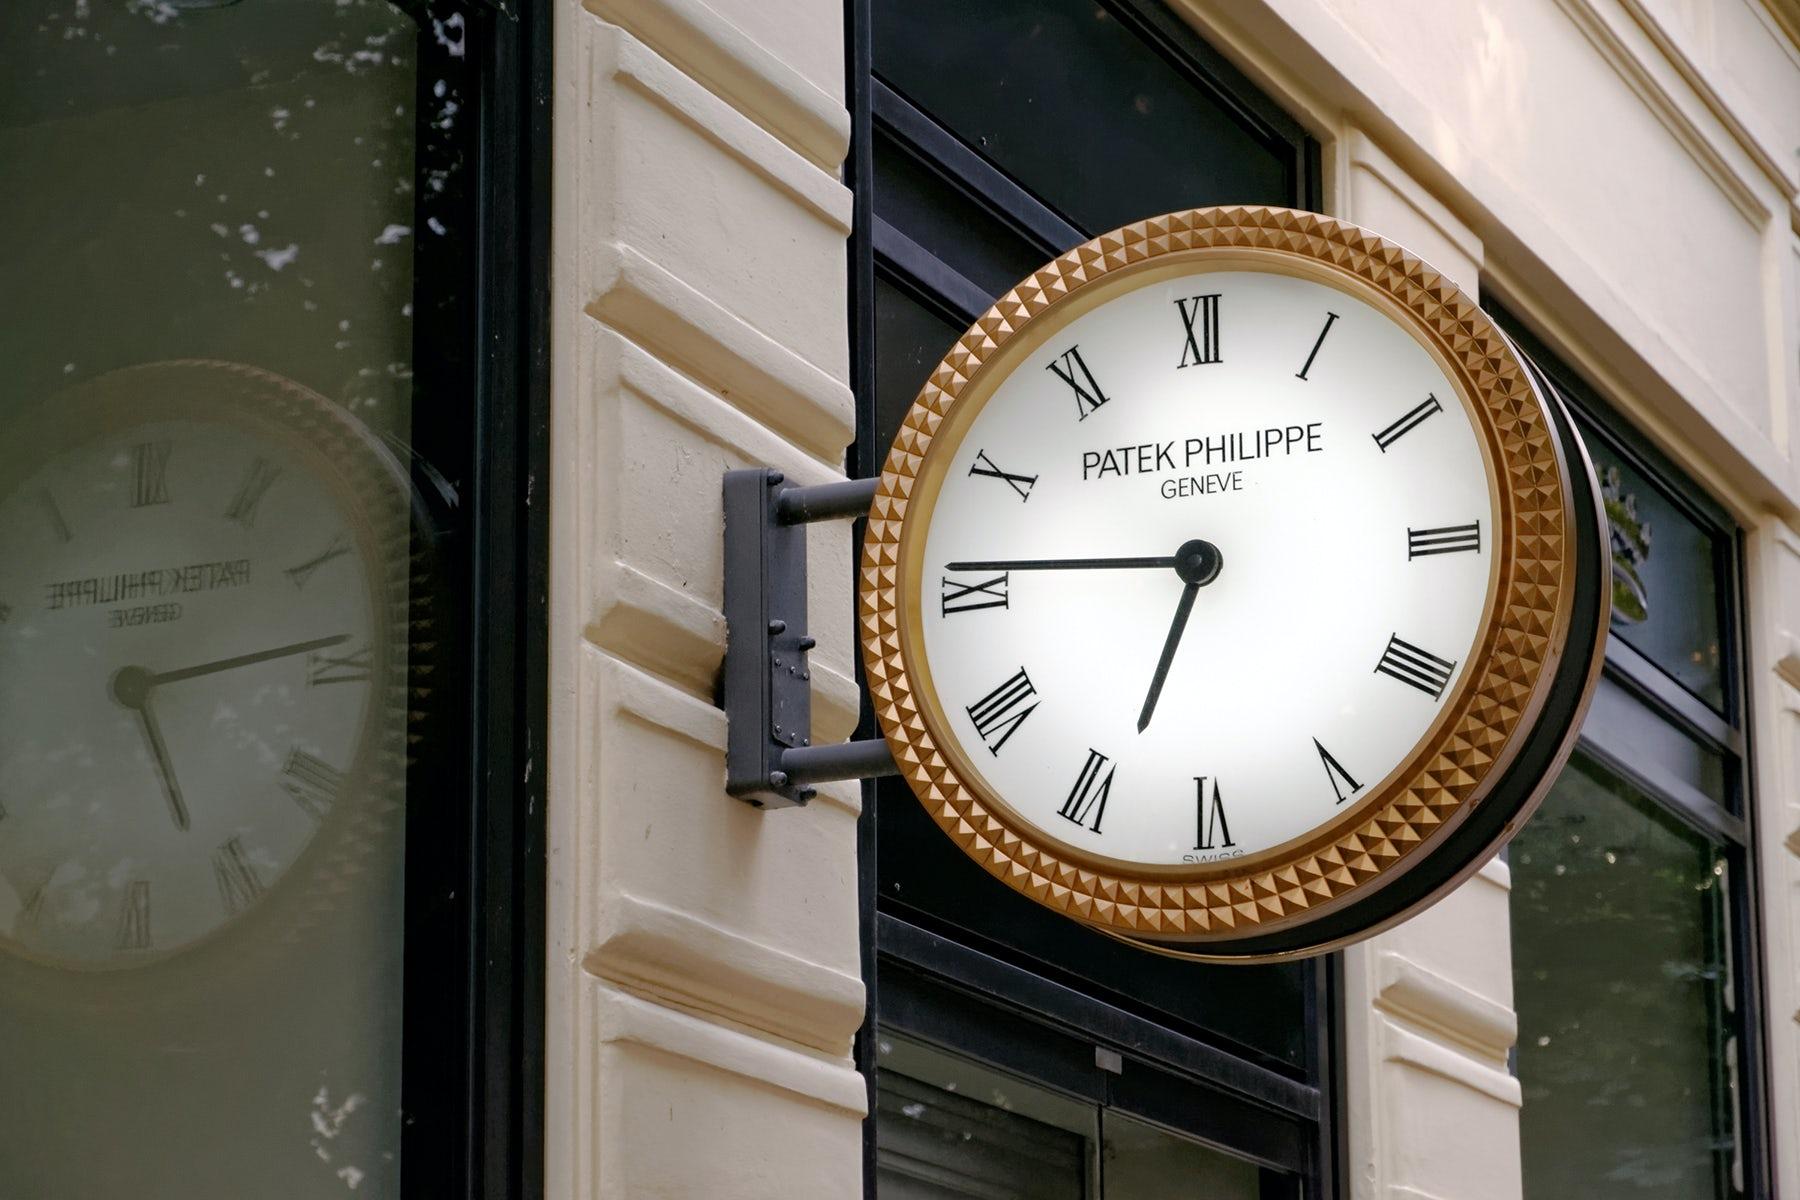 Patek Philippe analogue clock | Source: Shutterstock